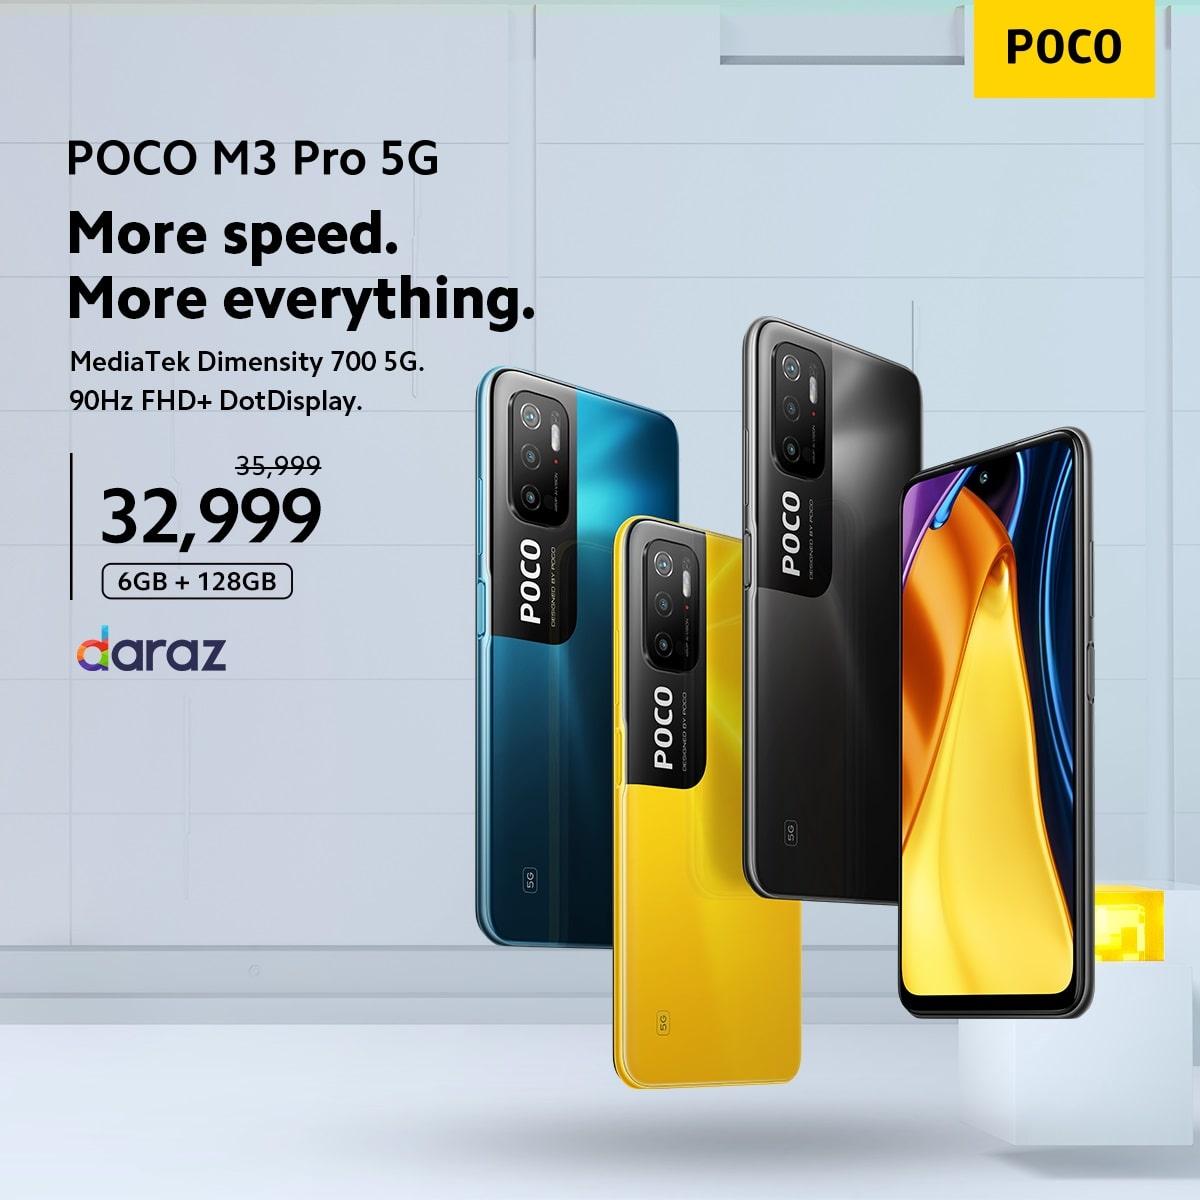 POCO-M3-Pro 5g 1-min